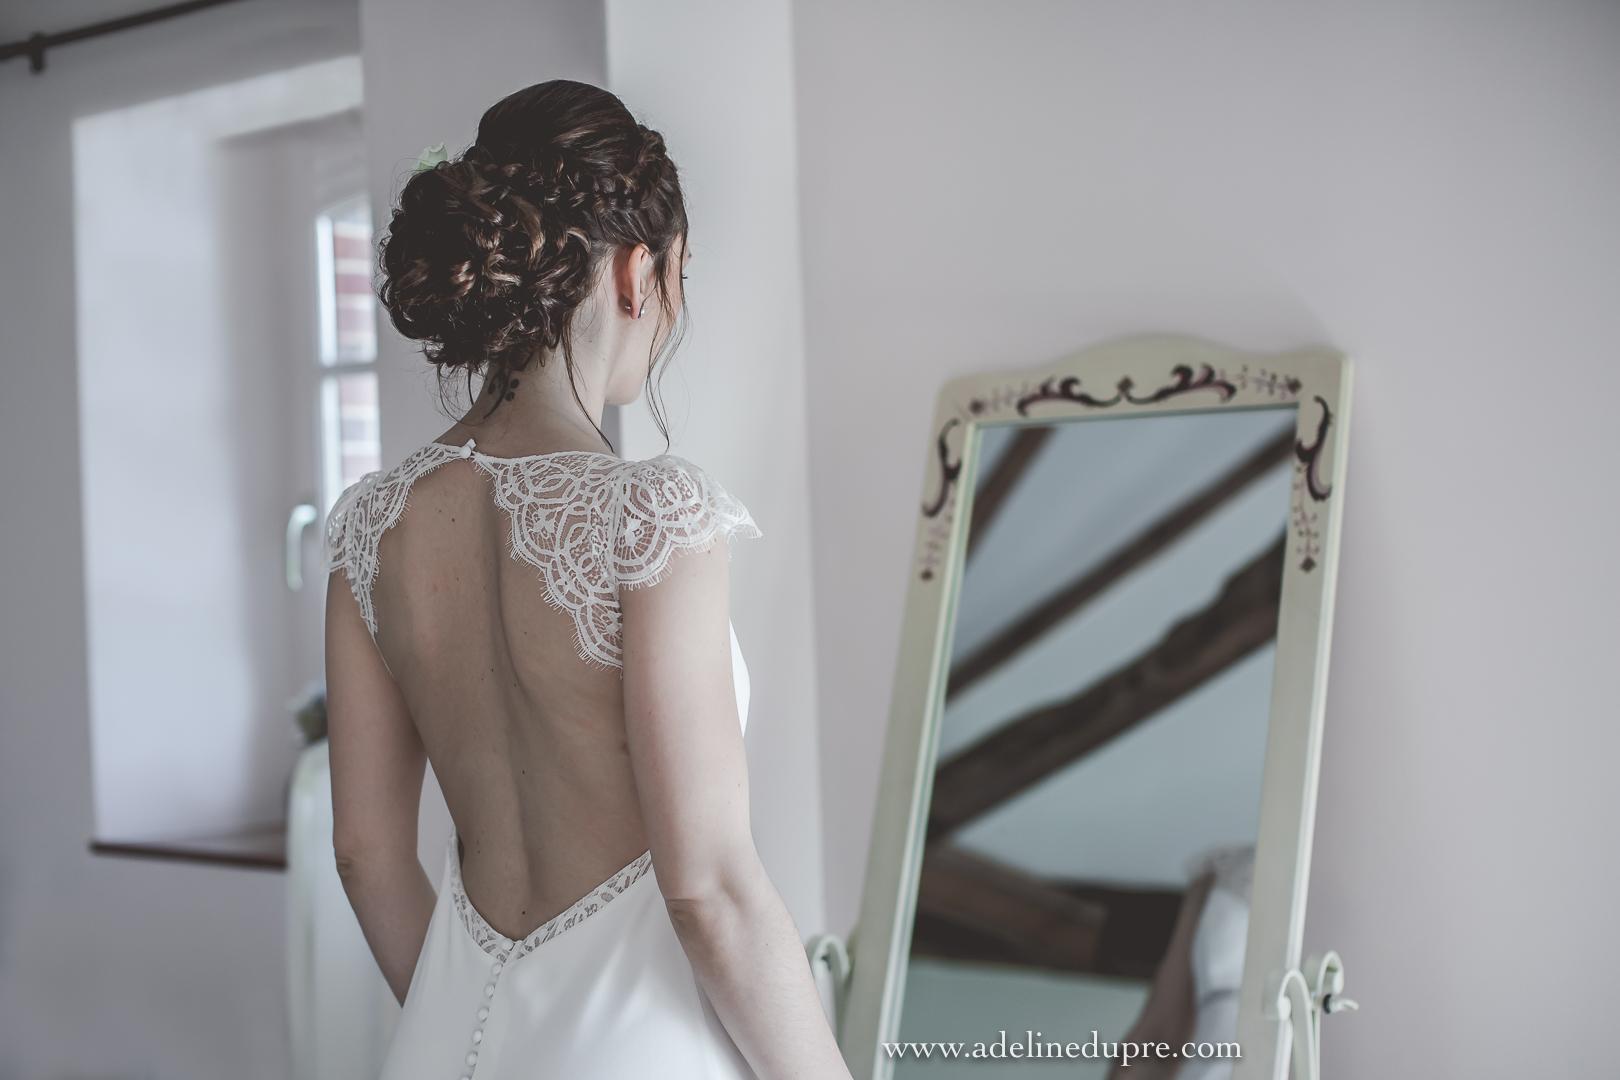 Adeline Dupre Photographe-